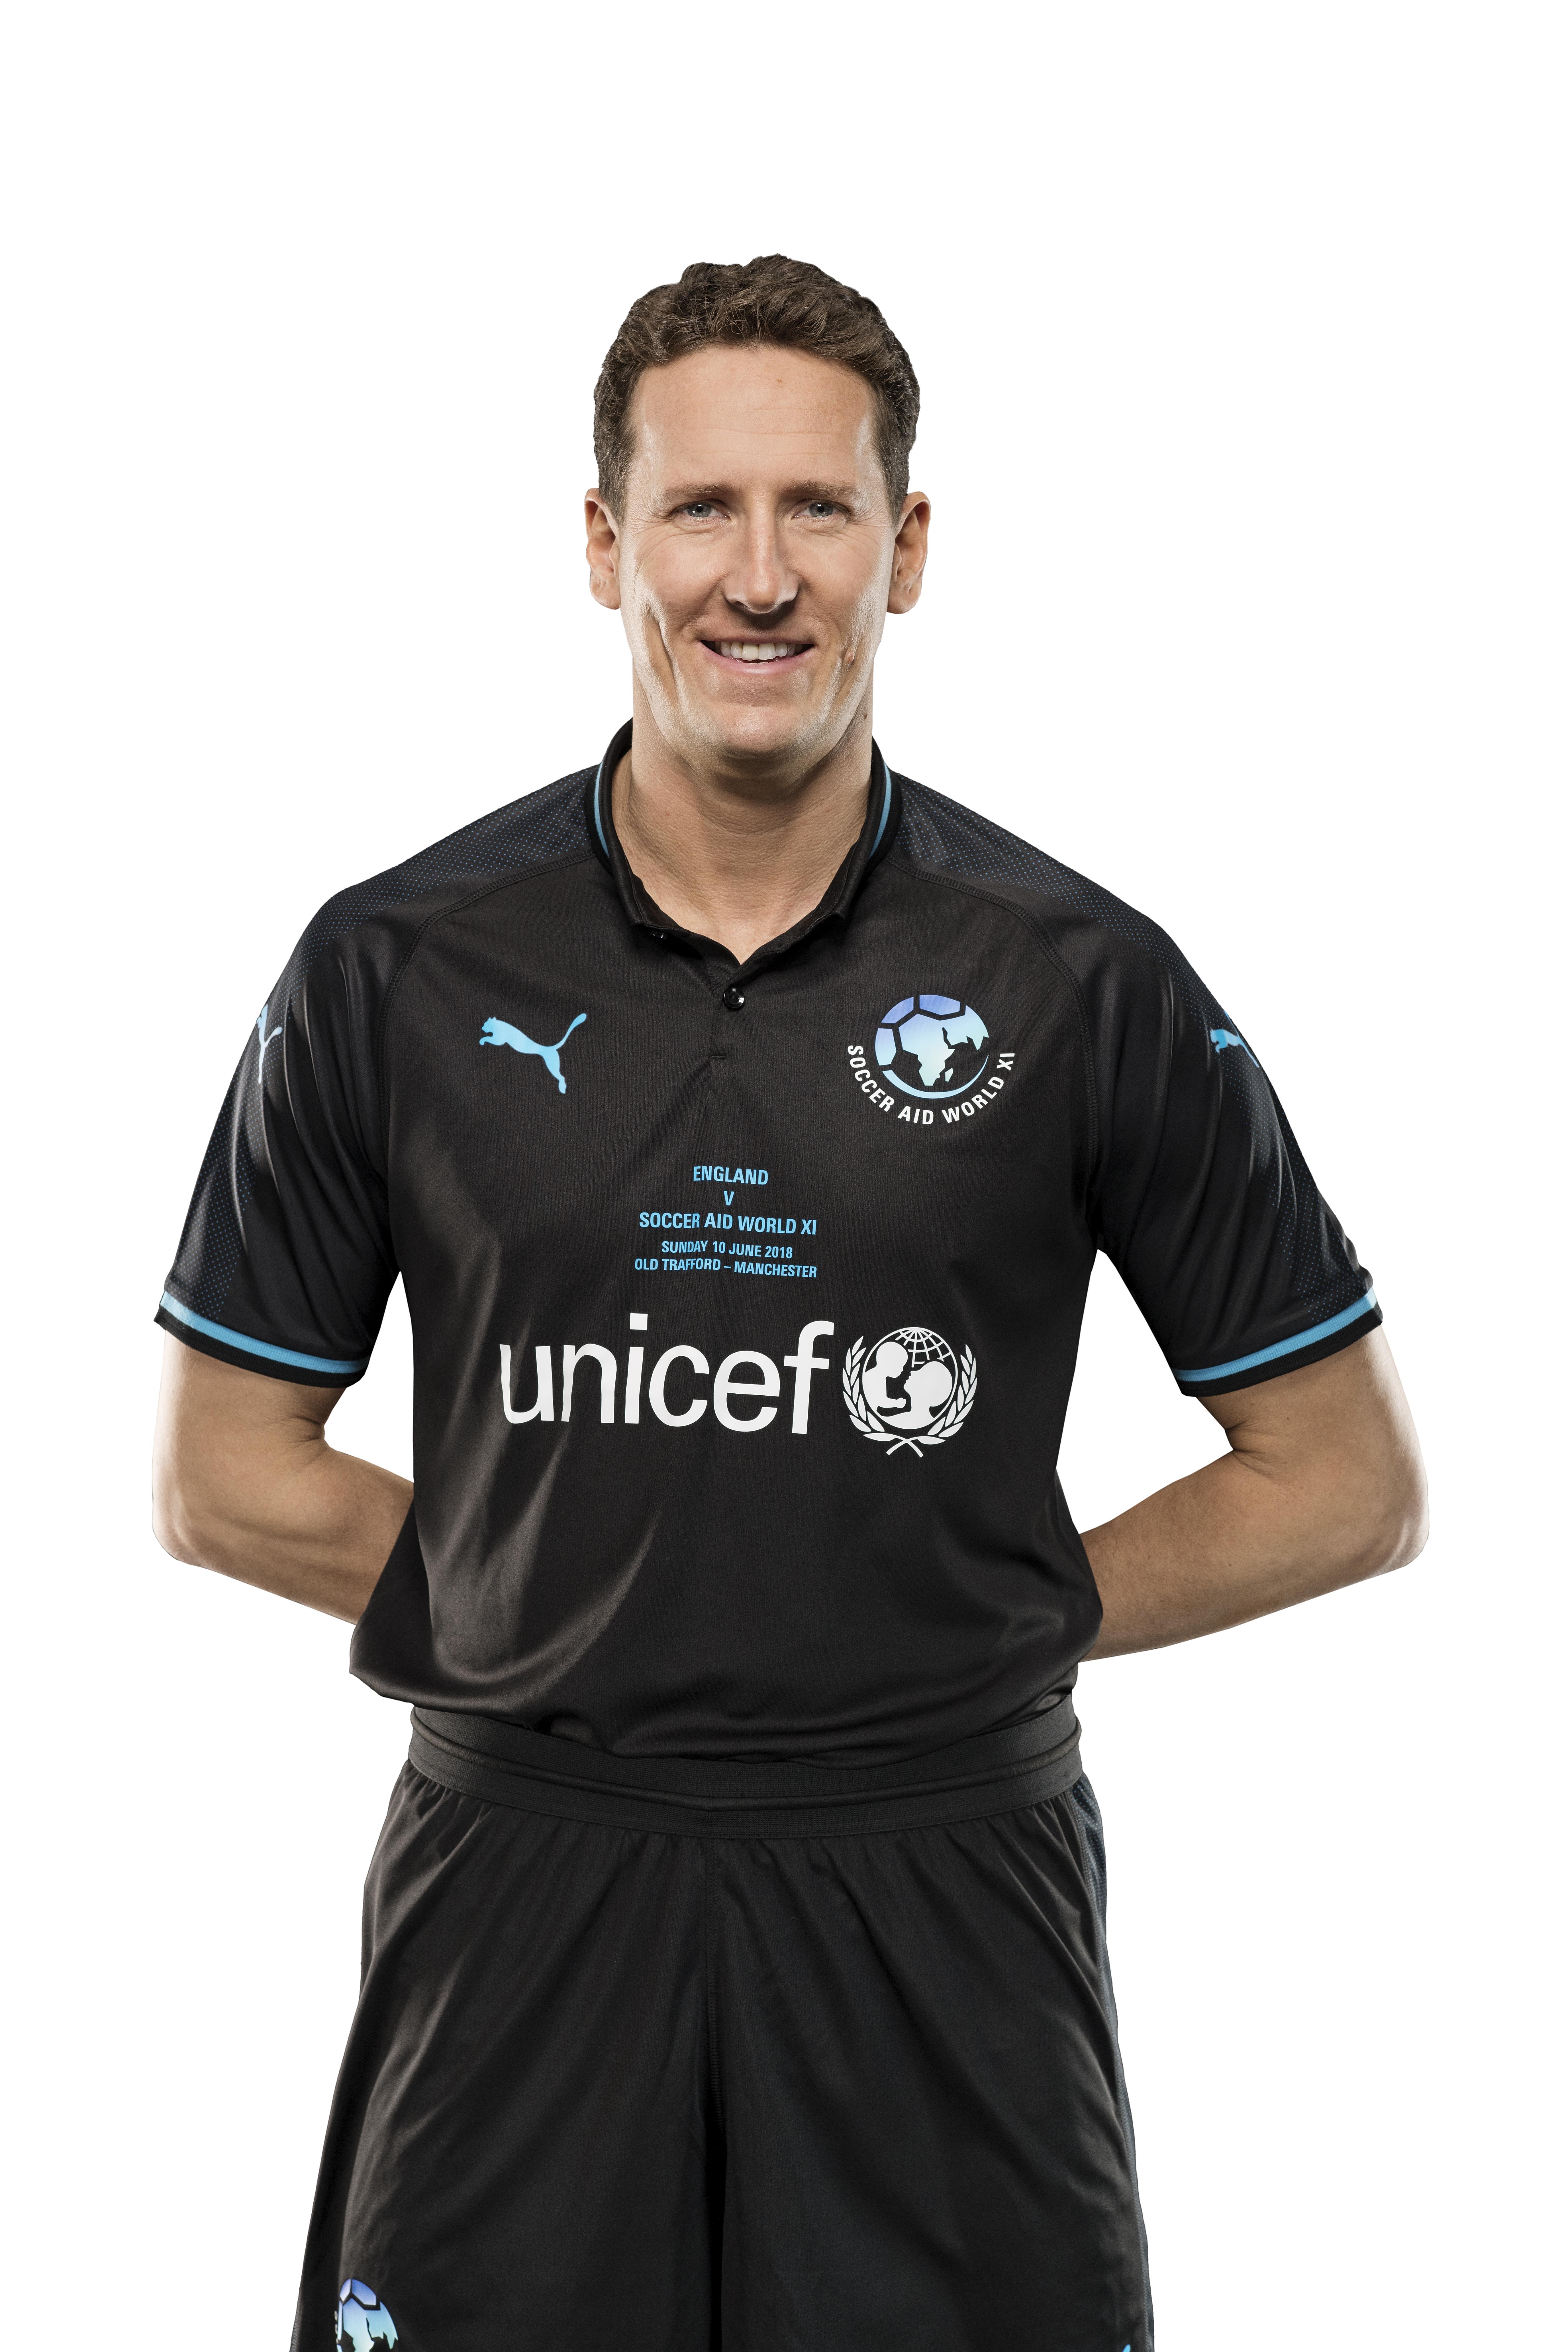 Brendan Cole plays for Soccer Aid for Unicef (SoccerAid/Unicef)